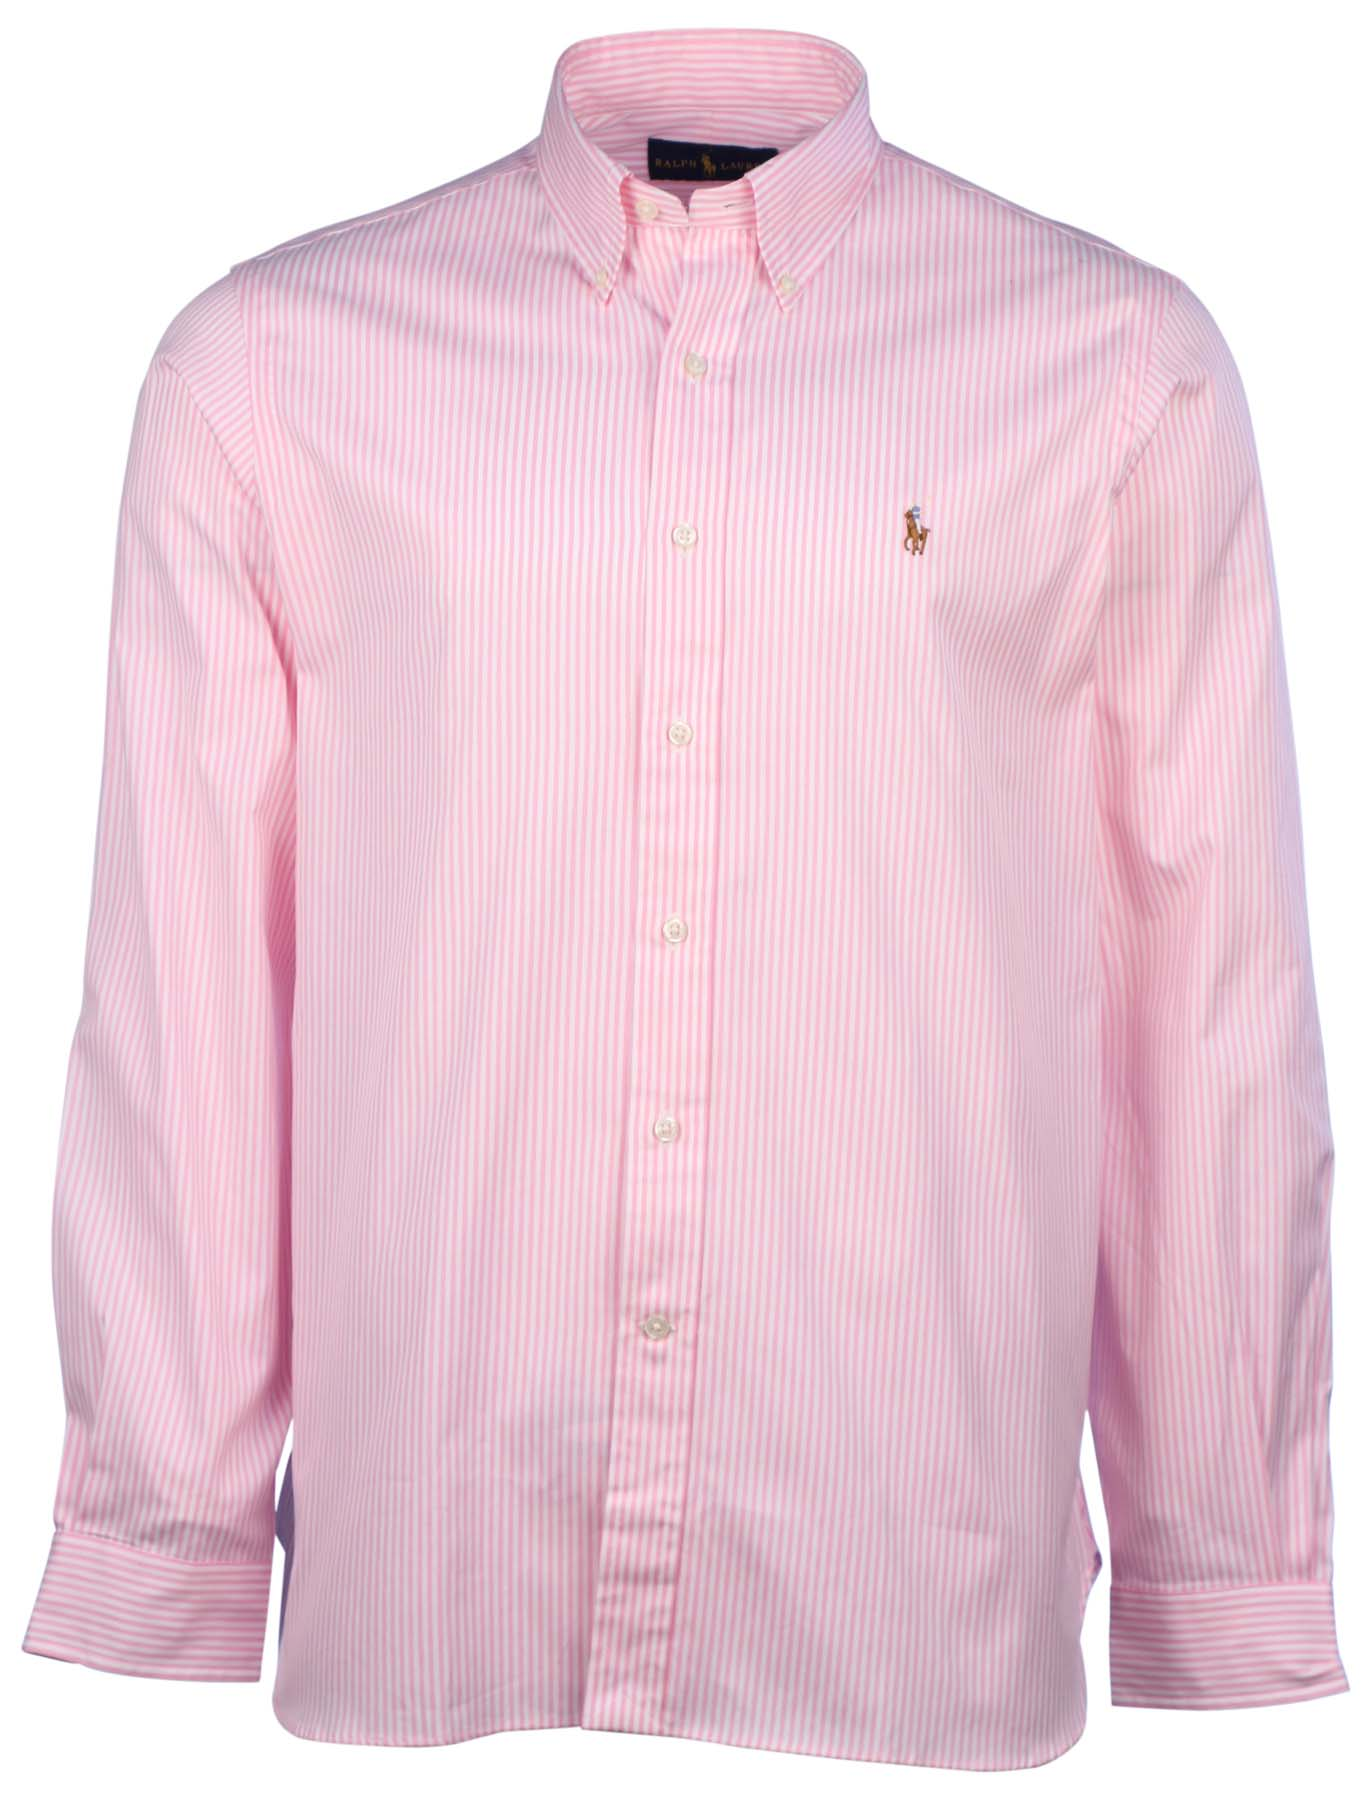 Polo ralph lauren men 39 s vertical stripe button down shirt for Striped button down shirts for men